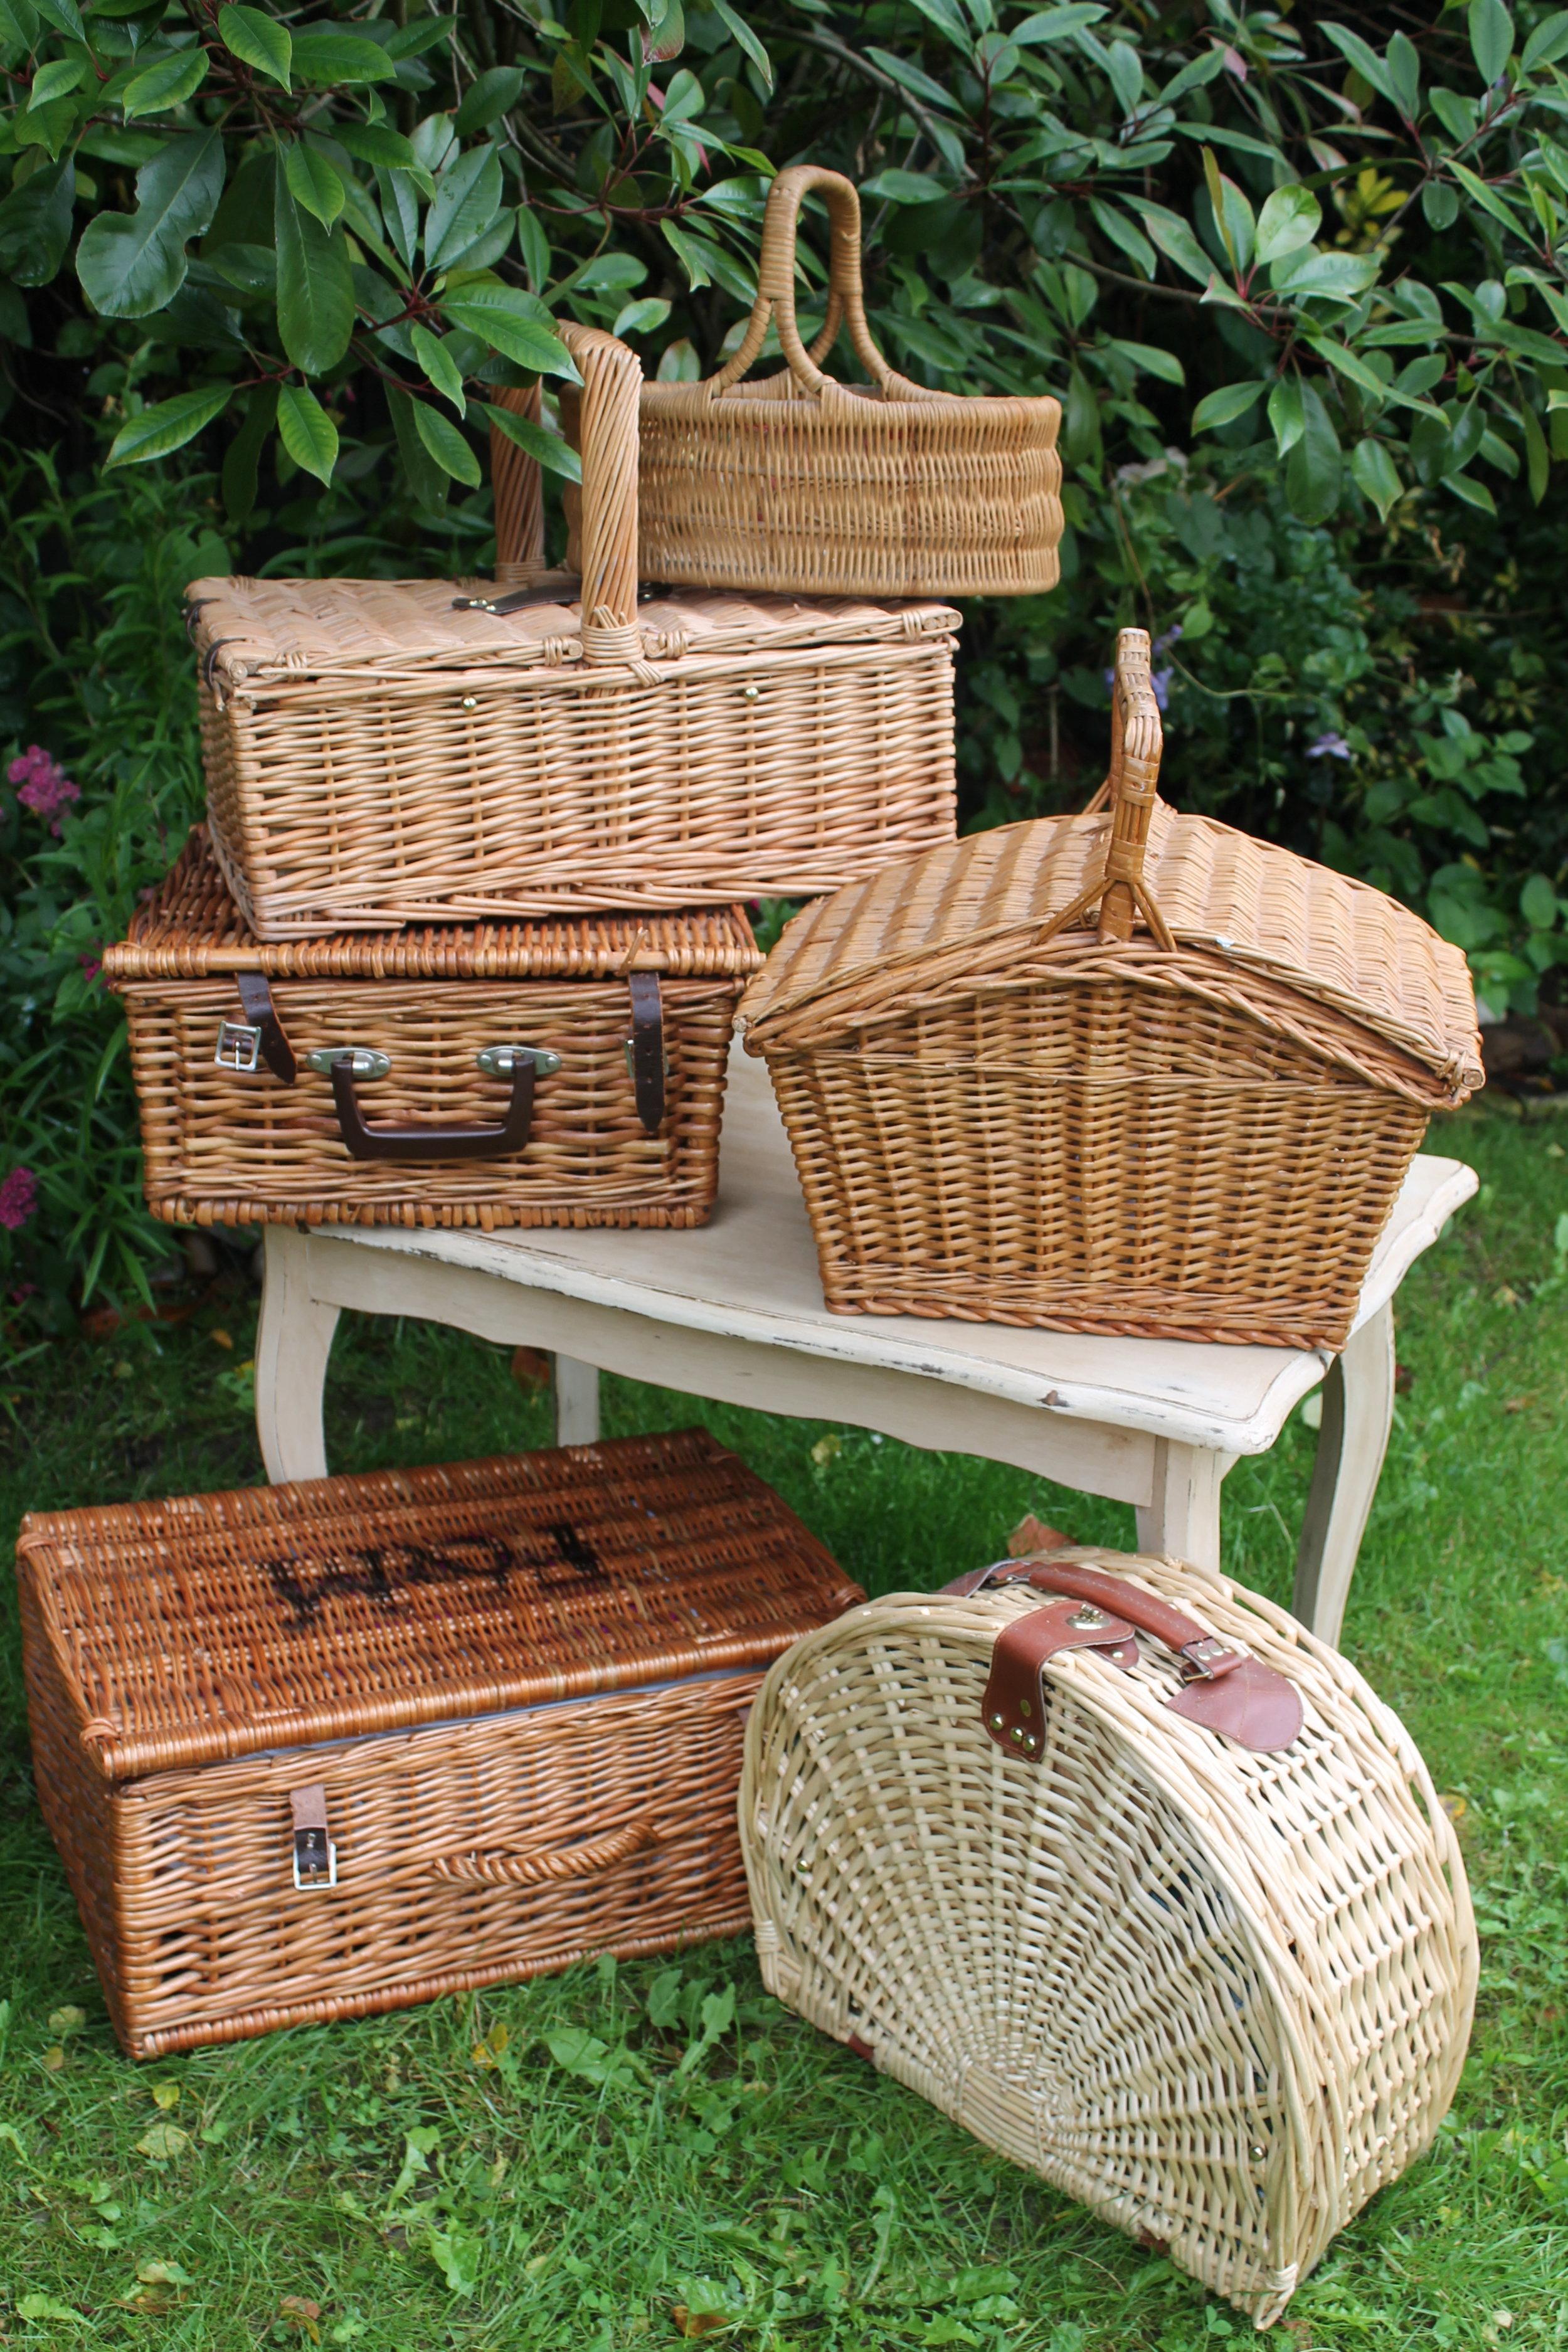 picnic baskets.JPG